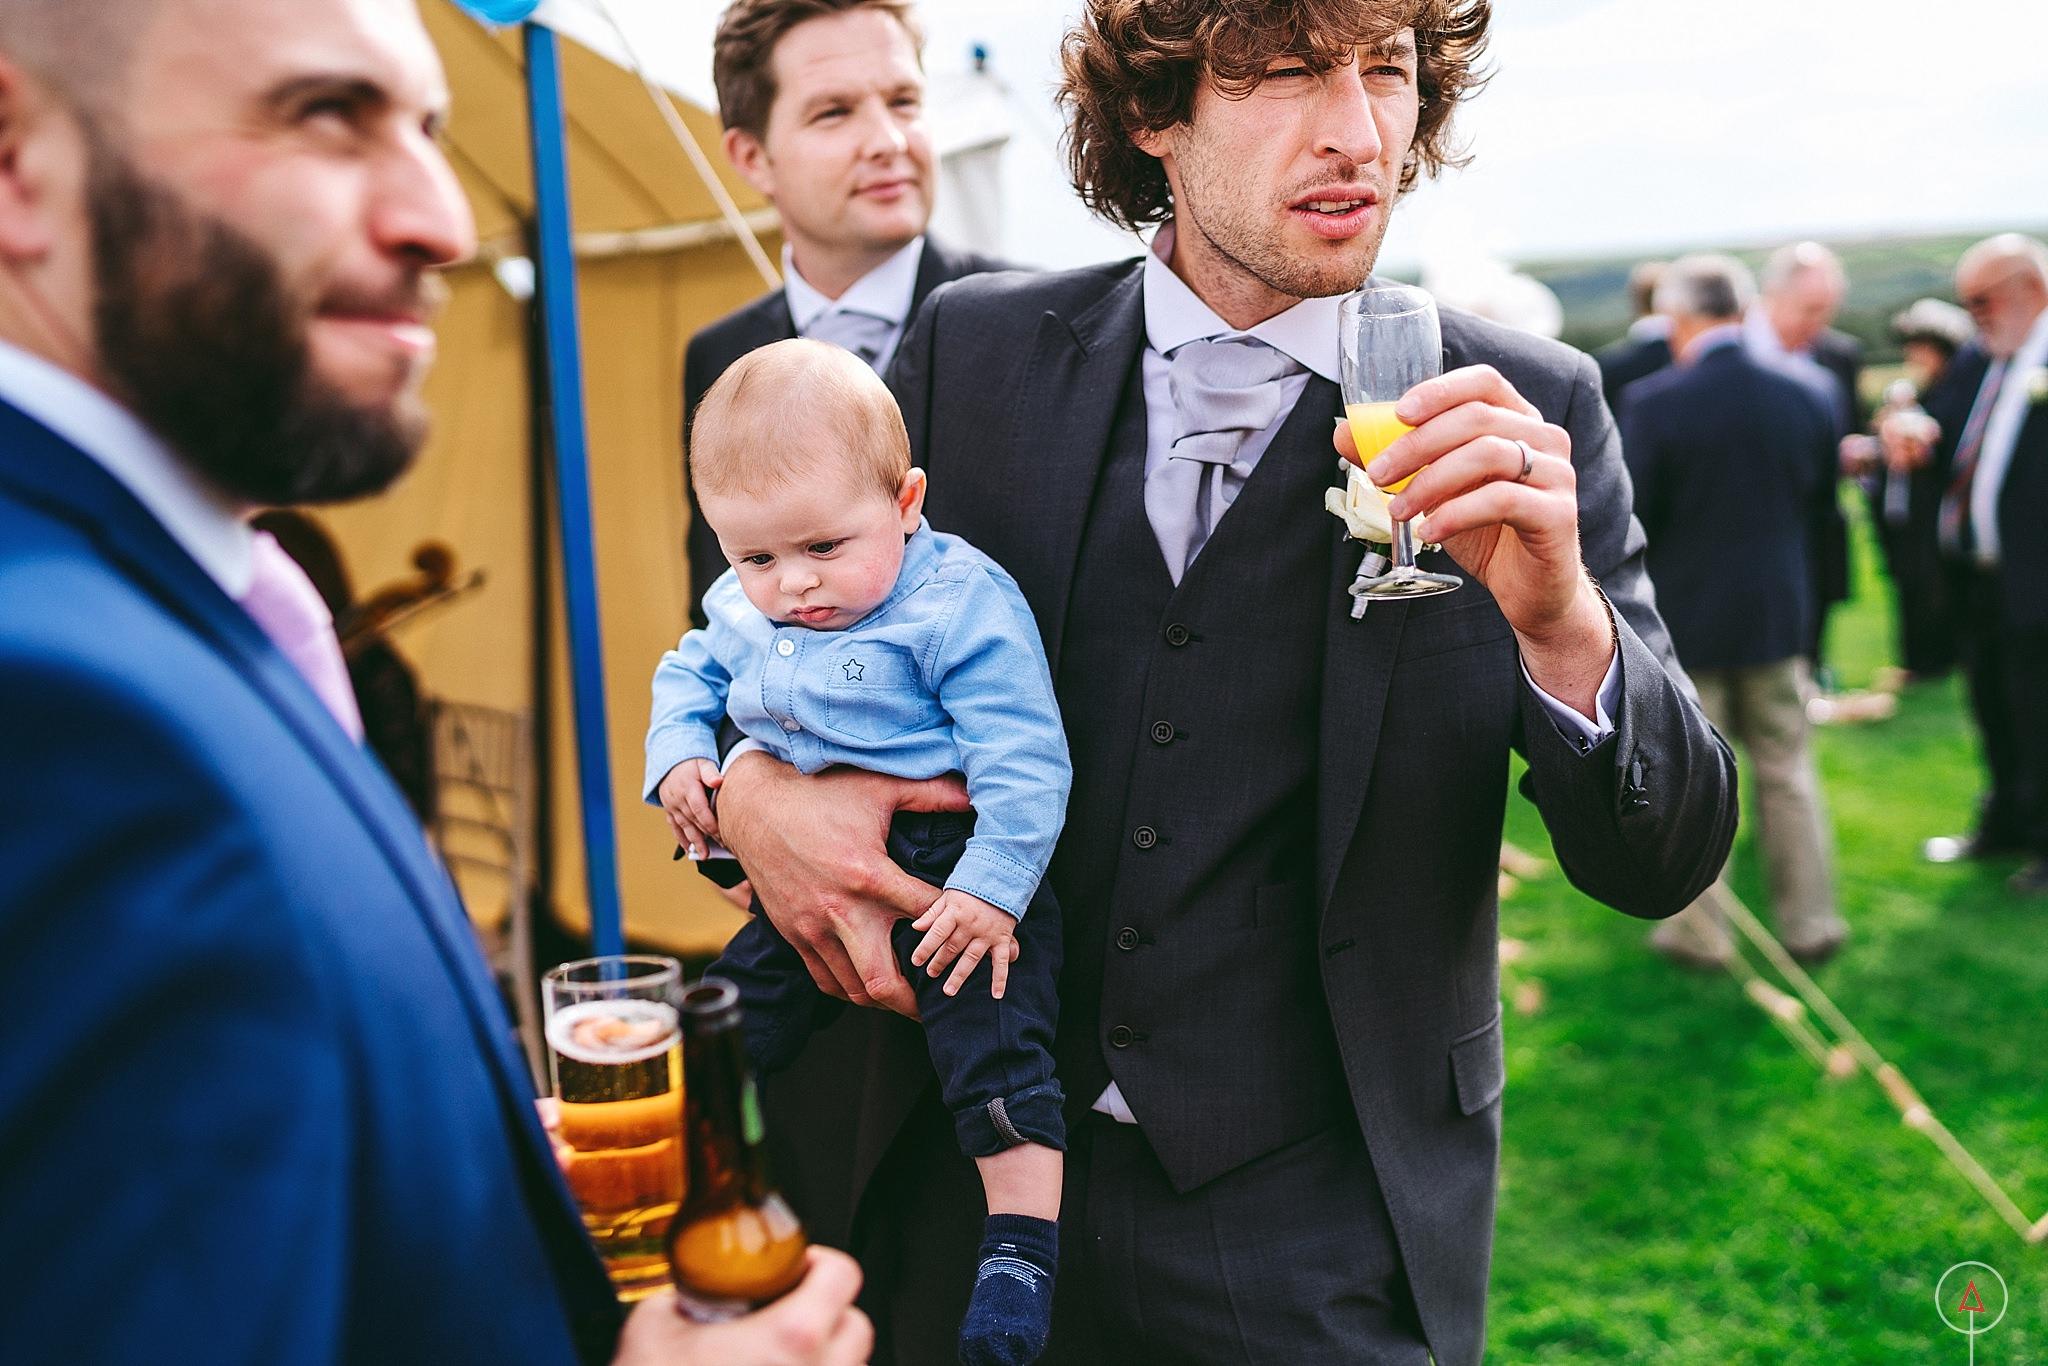 cardiff-wedding-photographer-aga-tomaszek_0392